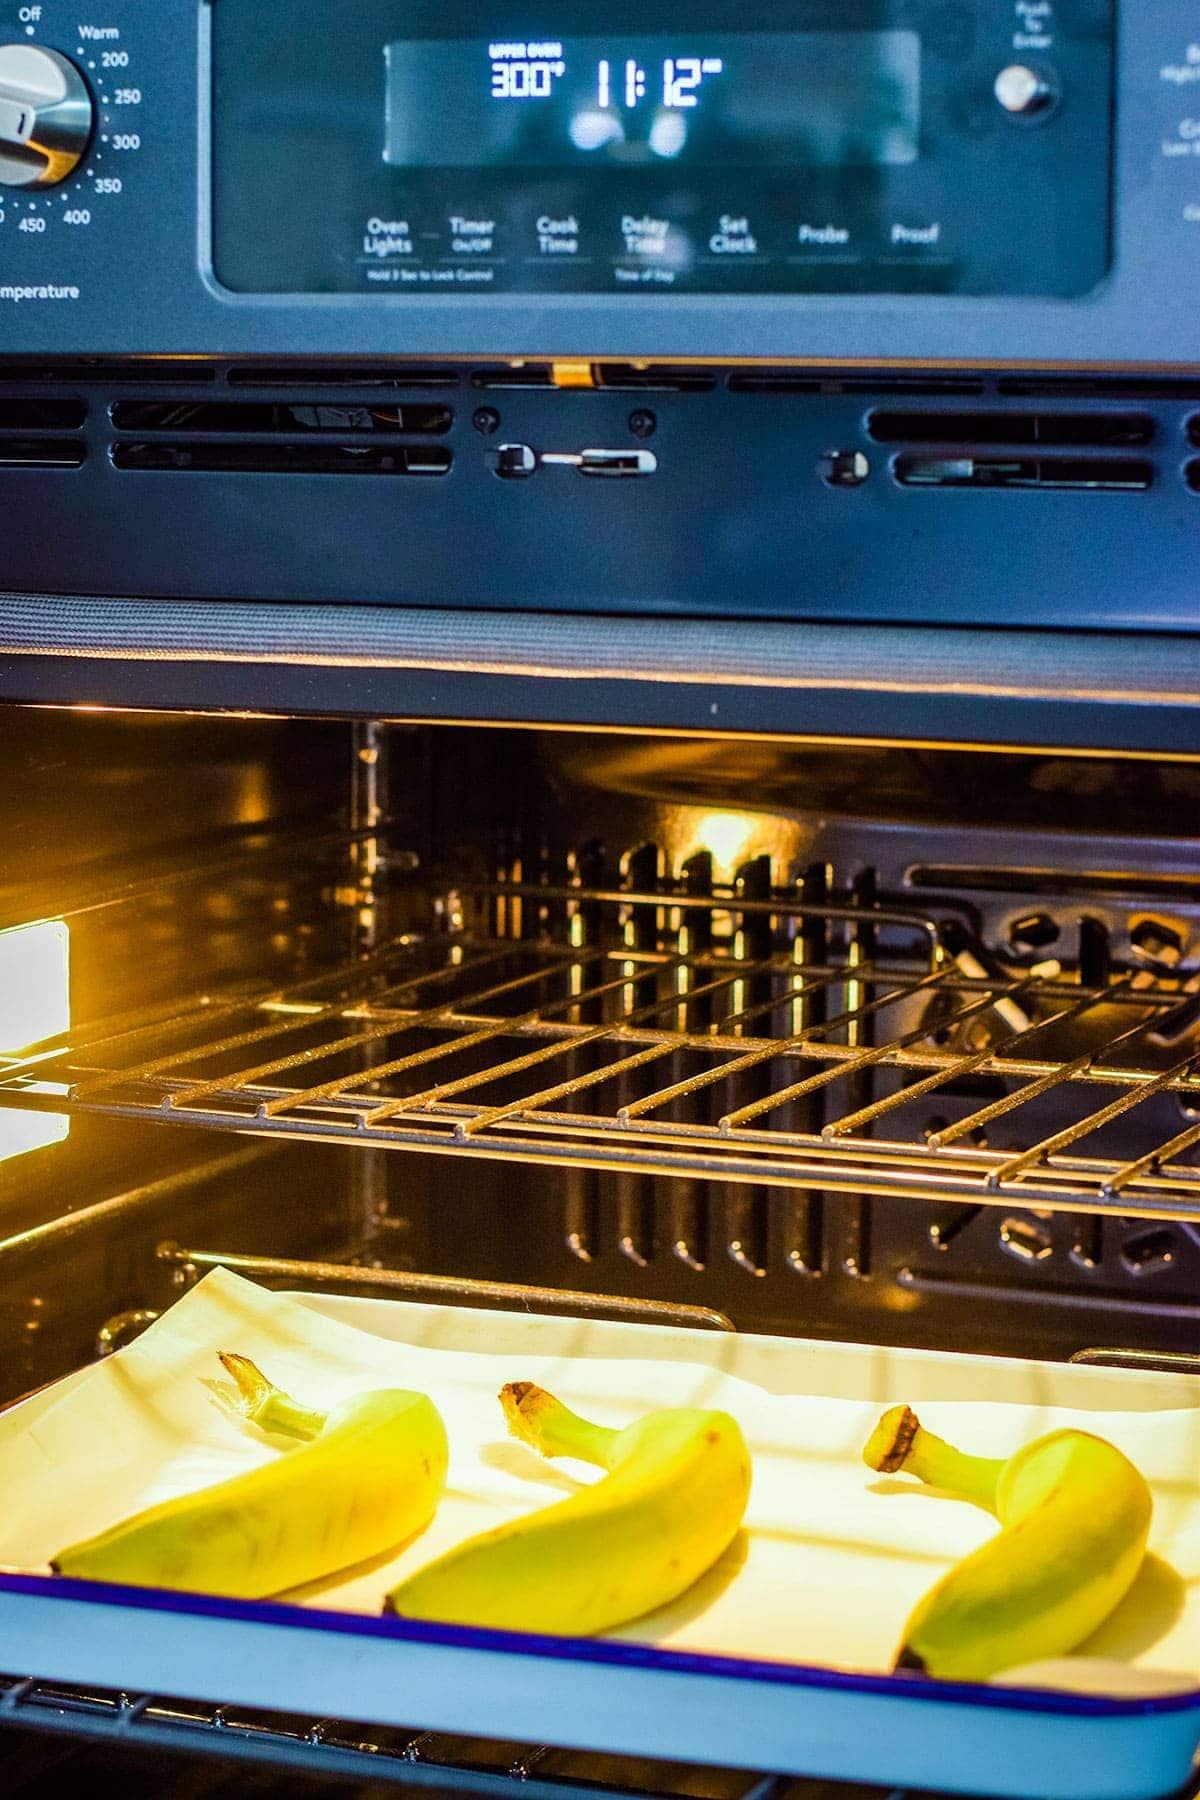 Bananas on baking sheet in oven